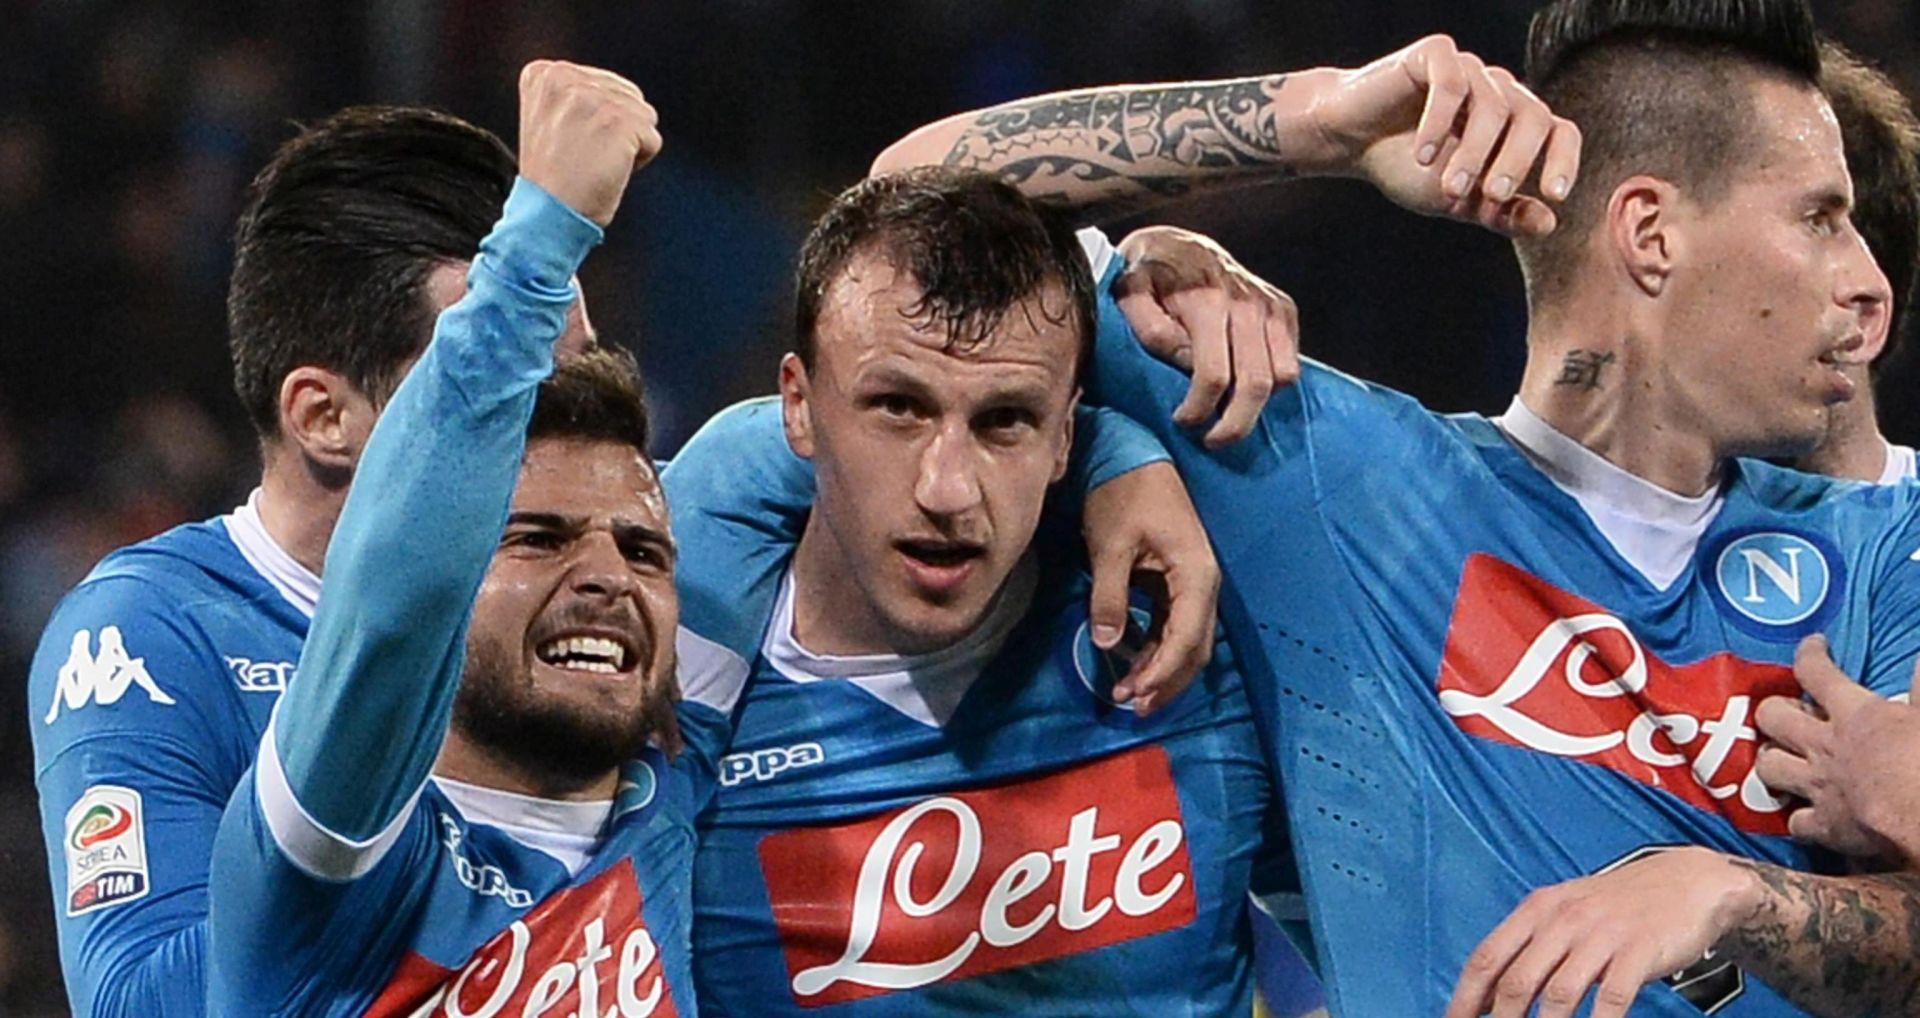 PRIVREMENI POVRATAK NA VRH SERIE A Napoli preokretom do tri boda protiv Chieva